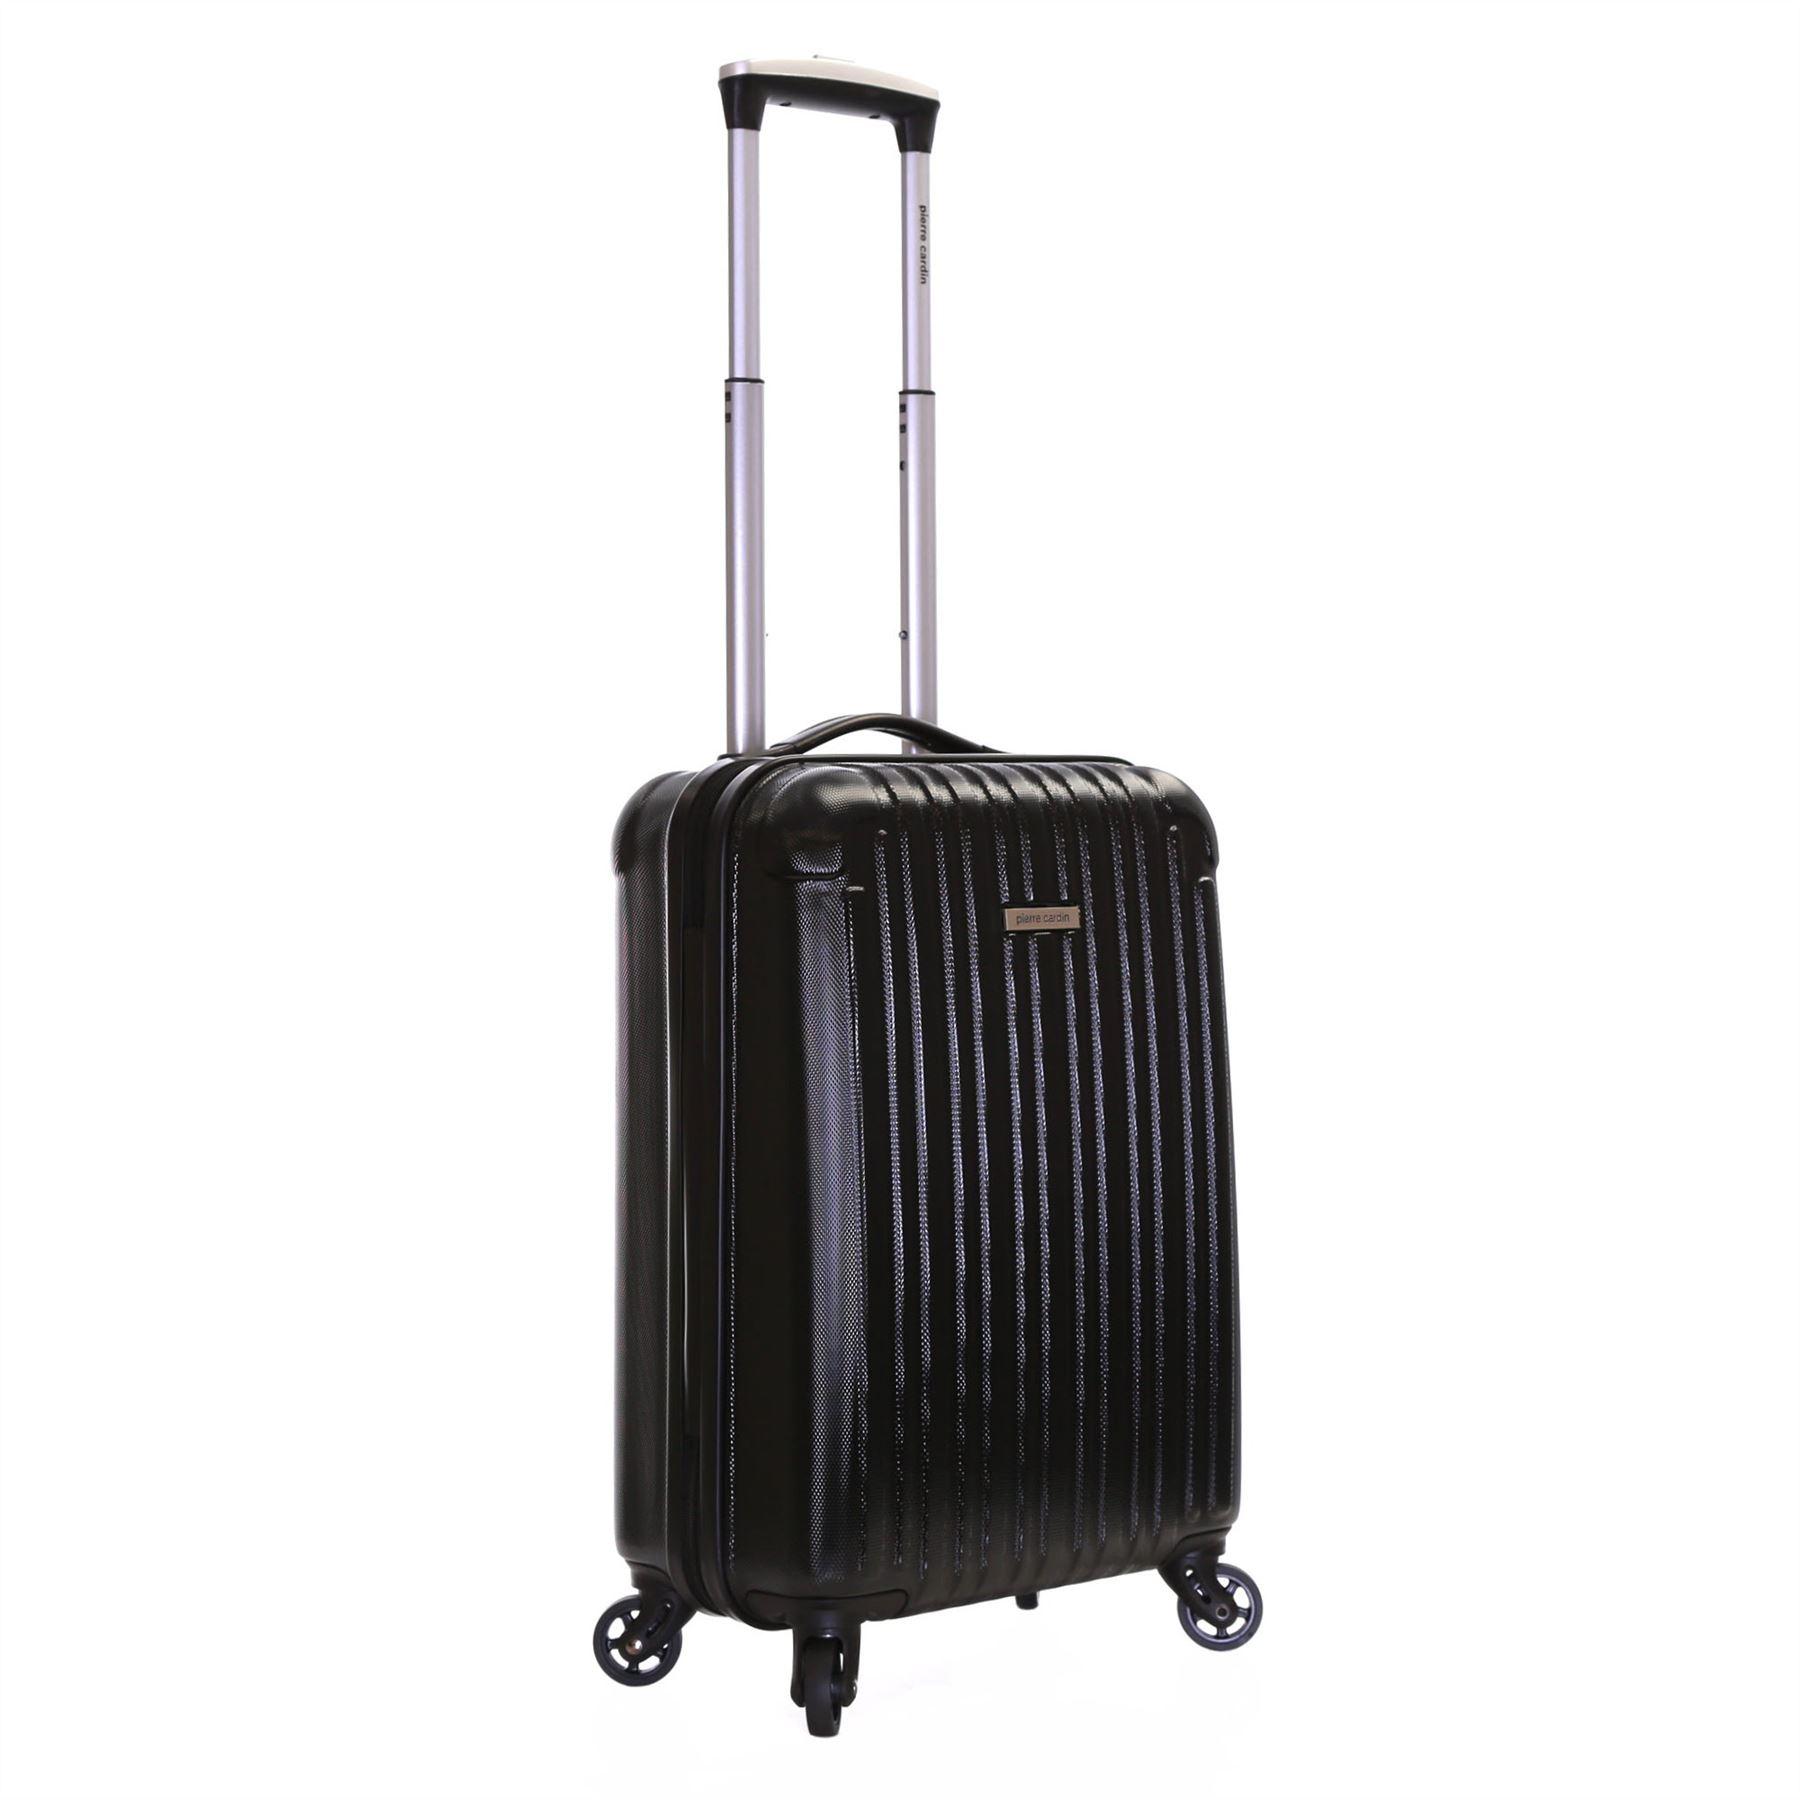 pierre cardin ryanair hard shell cabin flight trolley. Black Bedroom Furniture Sets. Home Design Ideas